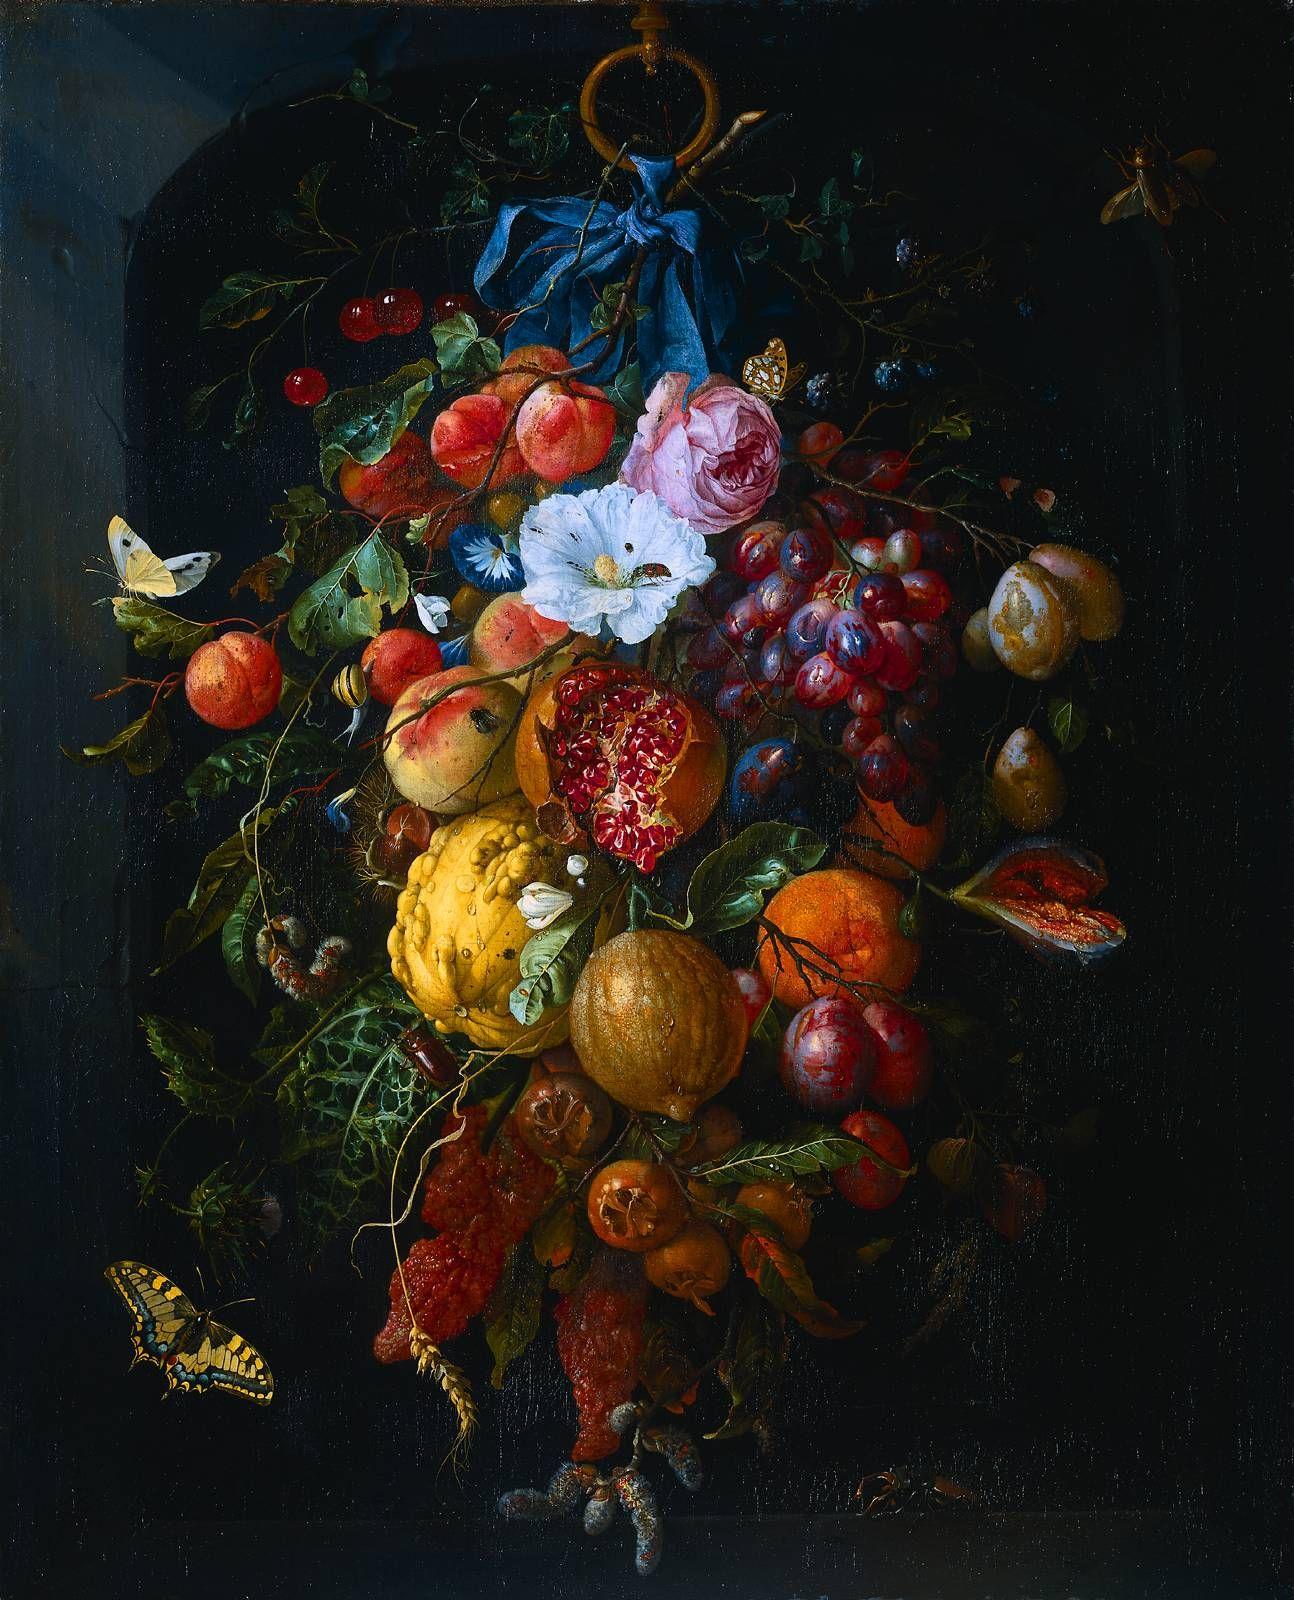 Resultado de imagen de bodegón de Jan Davidsz de Heem (Rijksmuseum,